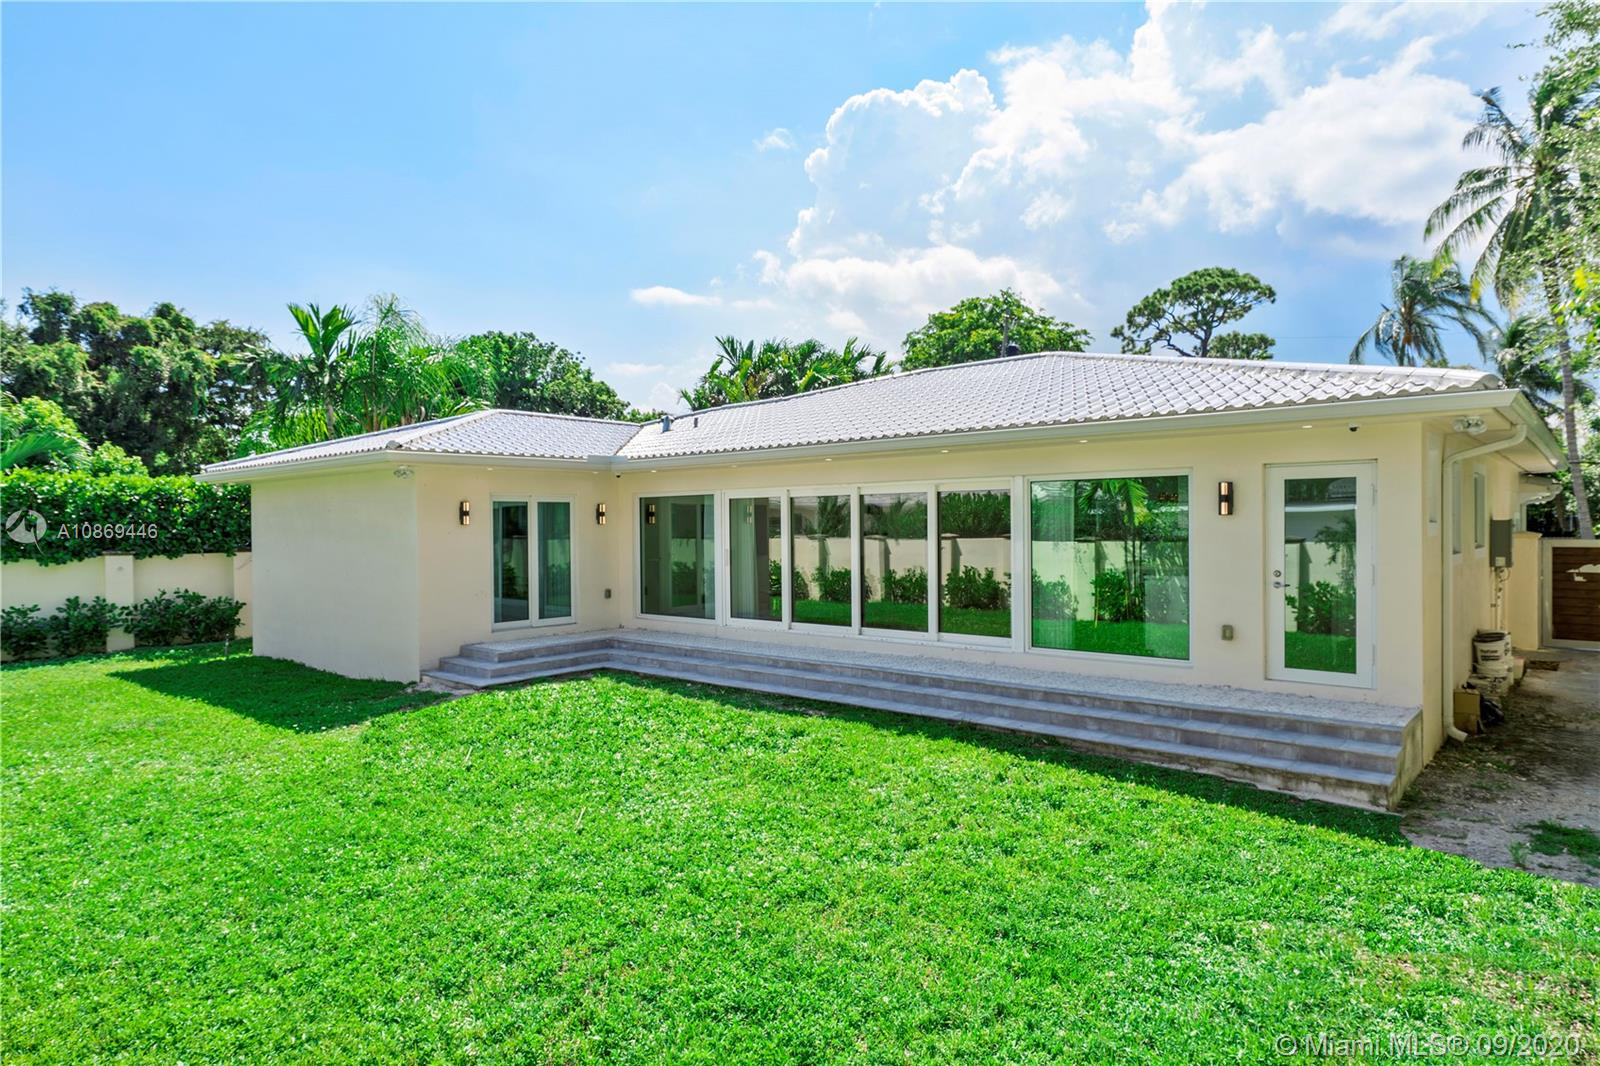 Miami Shores # - 55 - photo